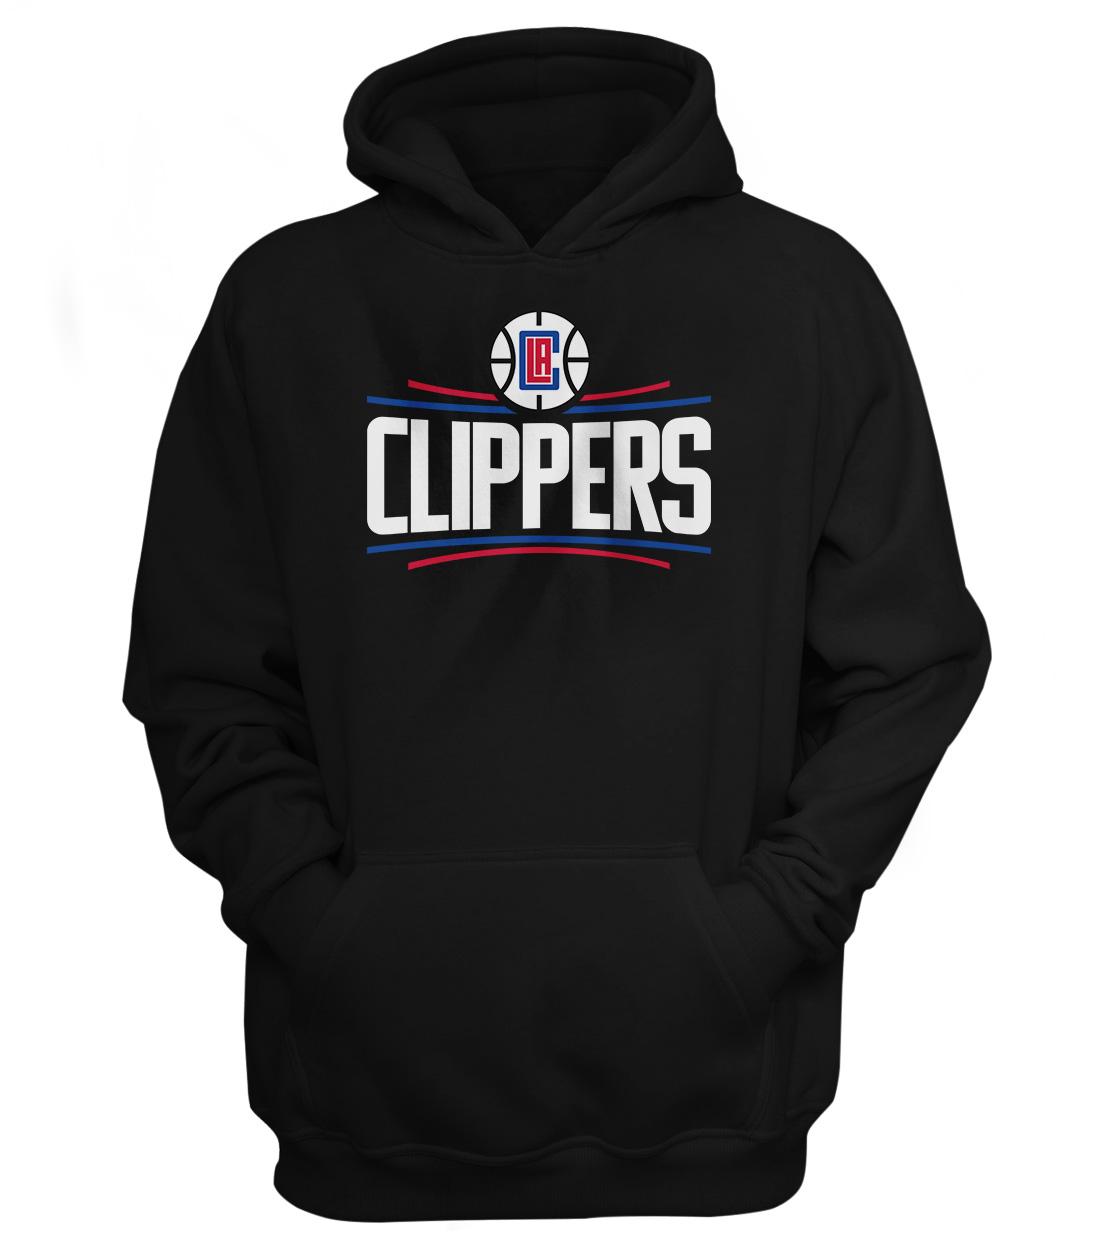 L.A. Clippers Hoodie (HD-BLC-NP-119-NBA-LAC-LOGO)